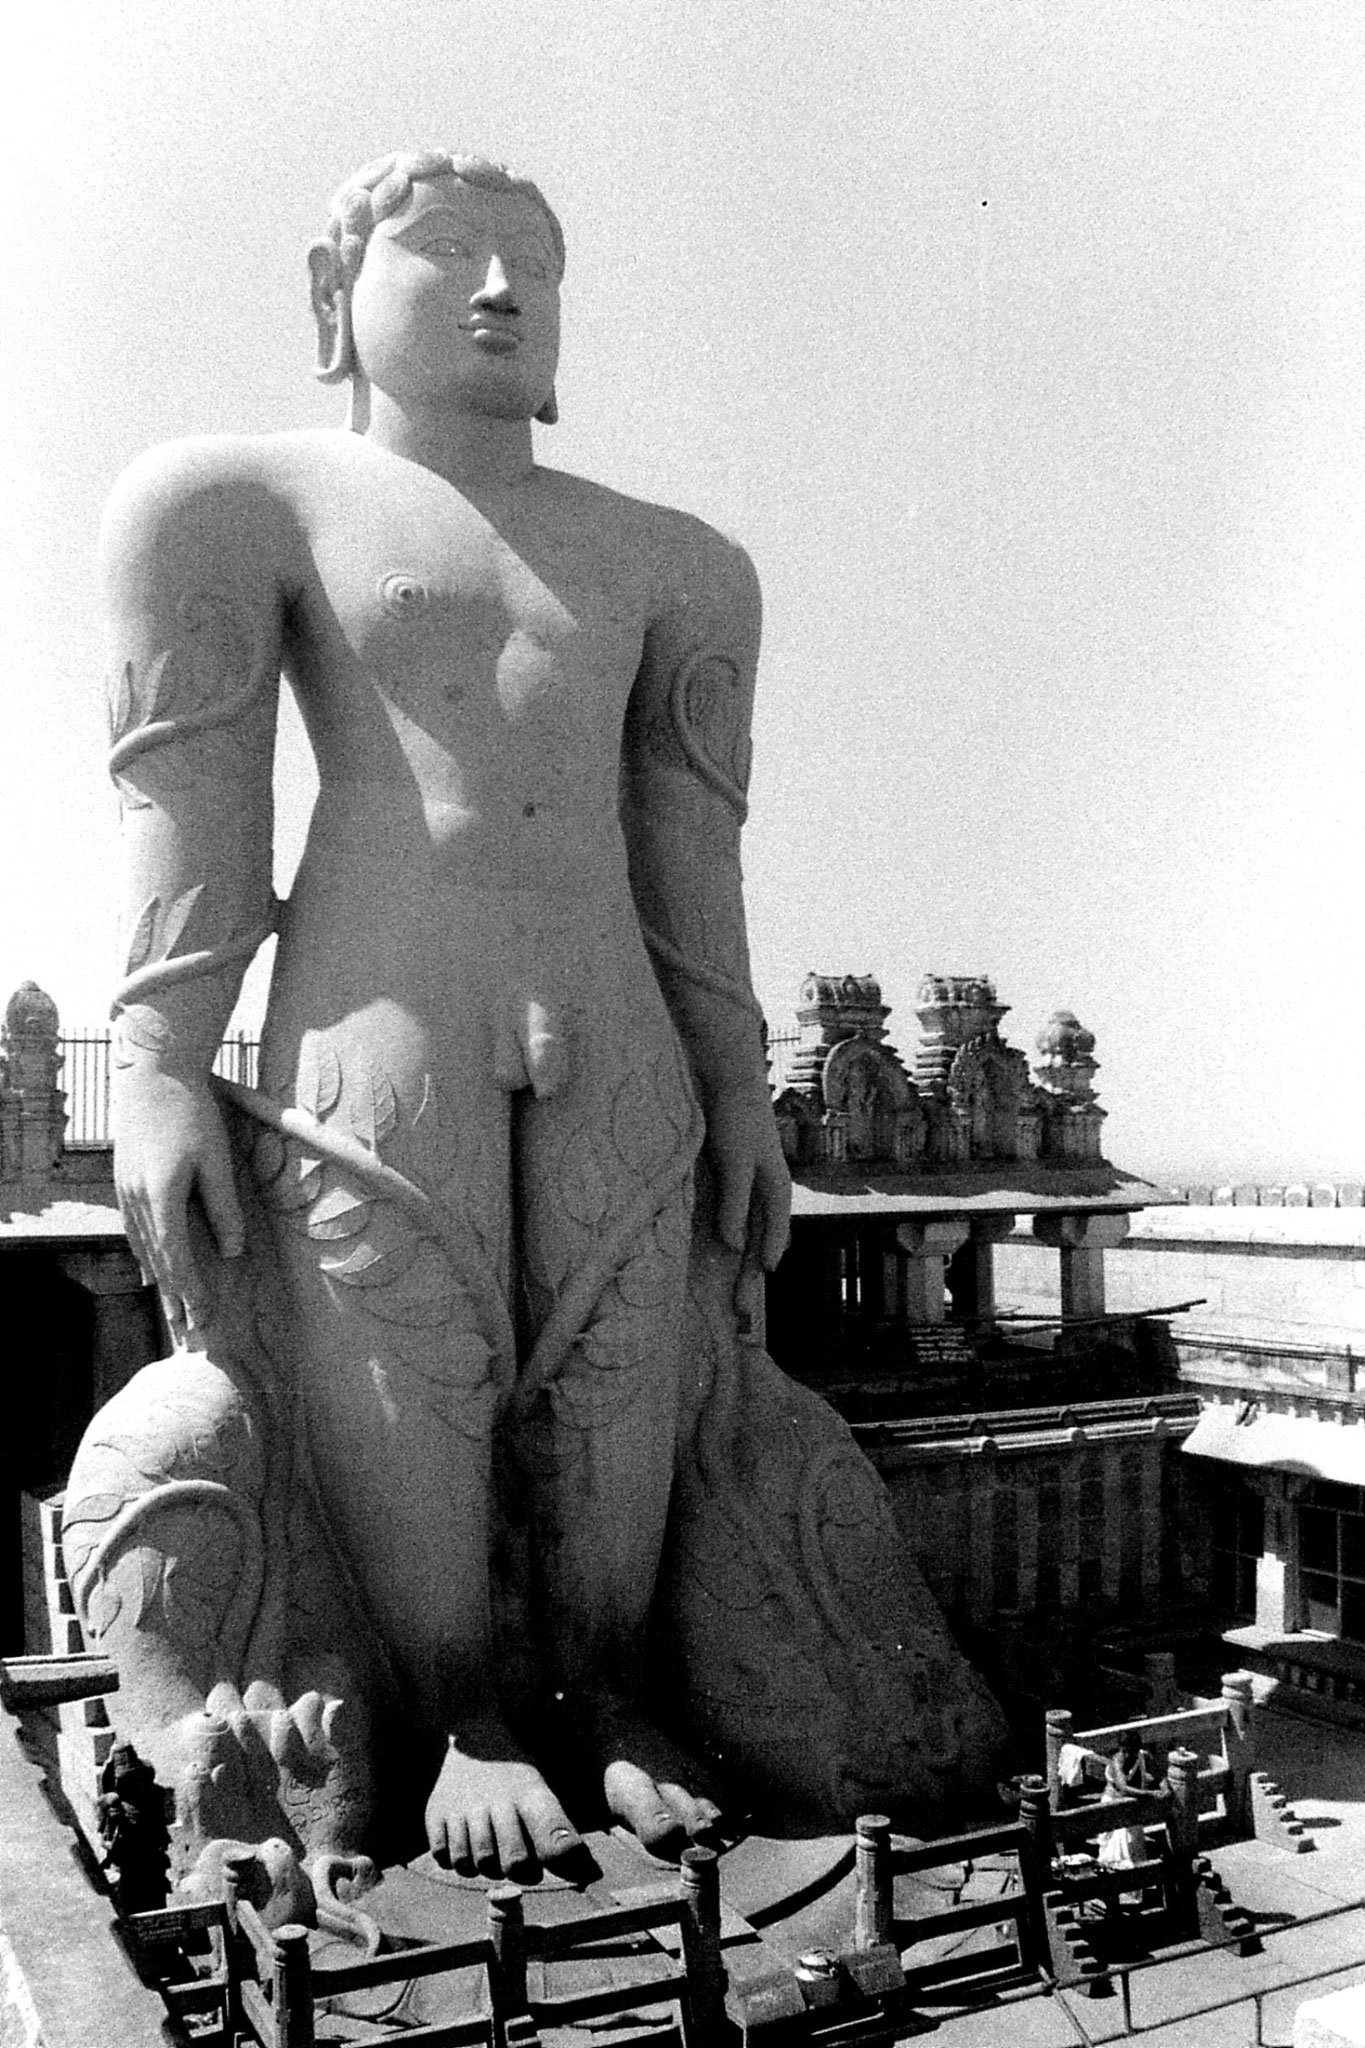 13/2/1990: 30: Sravanabelagola 17m statue